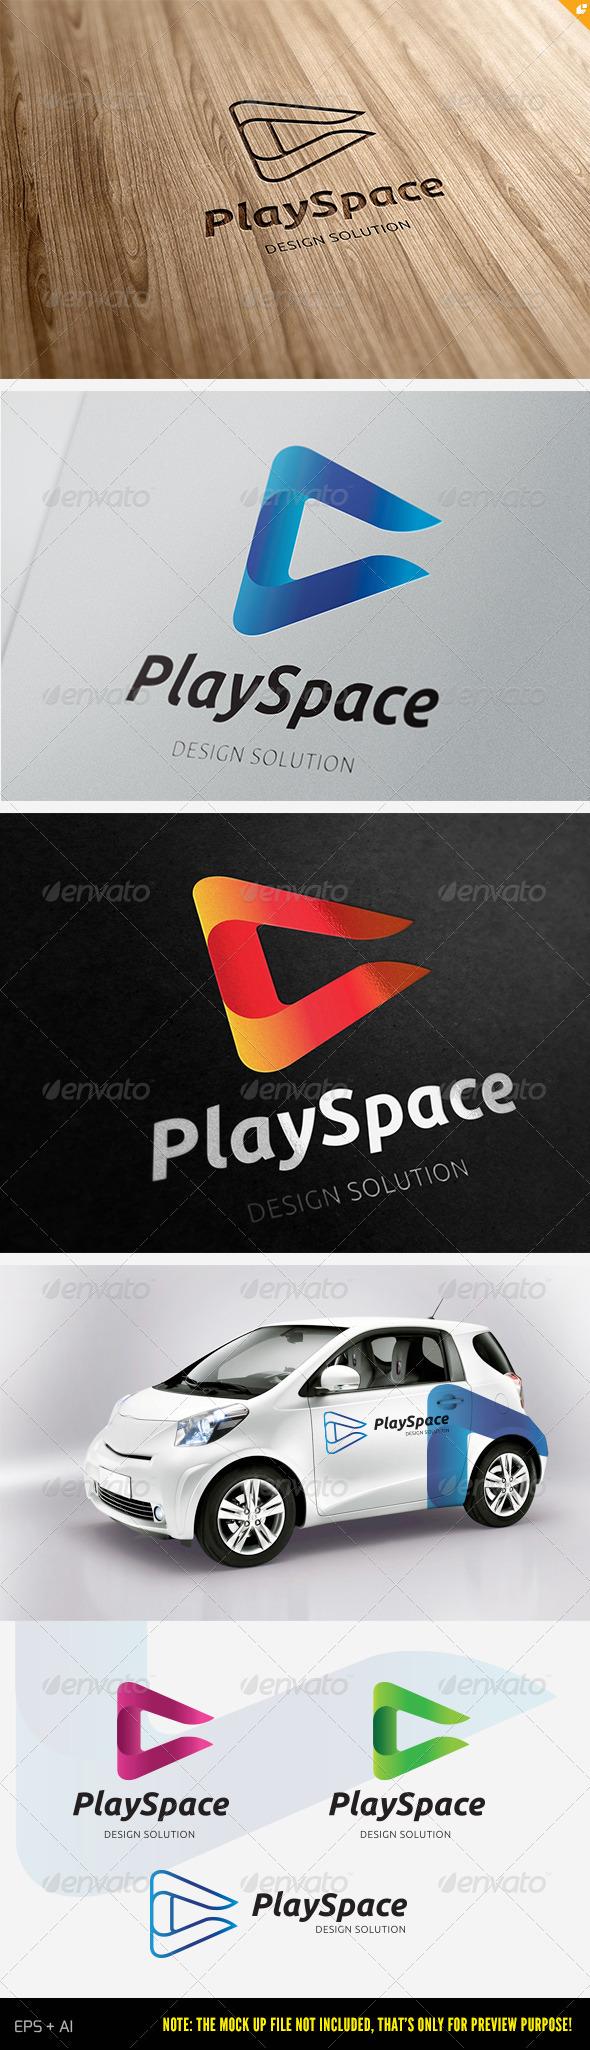 Play Space Logo - Vector Abstract